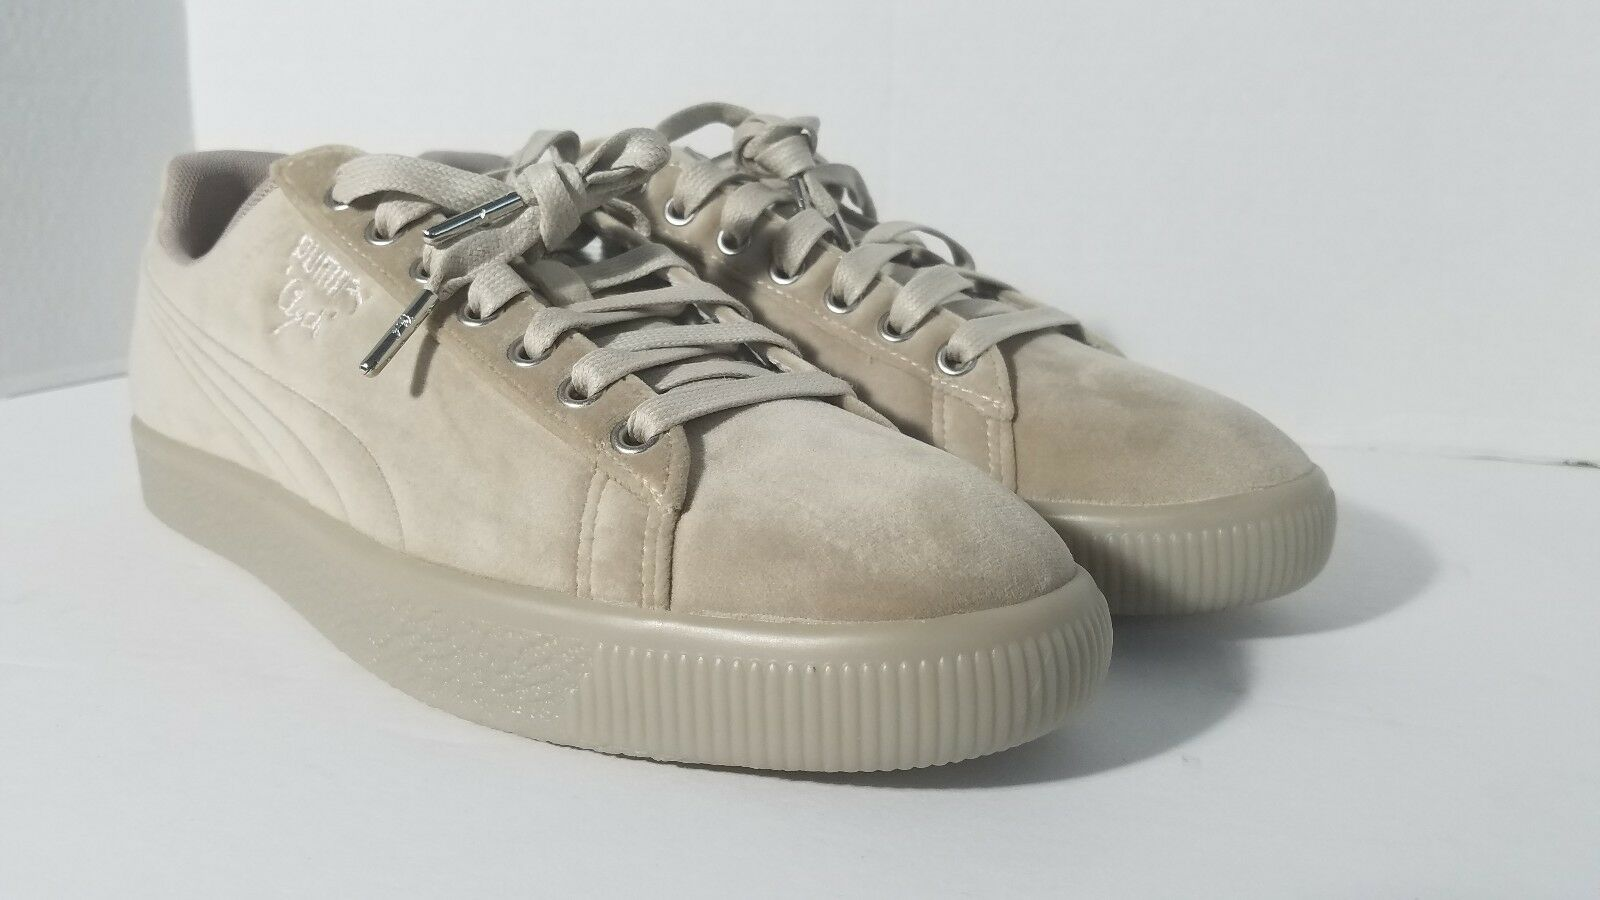 Puma Clyde Suede Classic Uomo scarpe scarpe scarpe da ginnastica scarpe 11 grigio Tan Limited Ed. Brand New 7e8cab